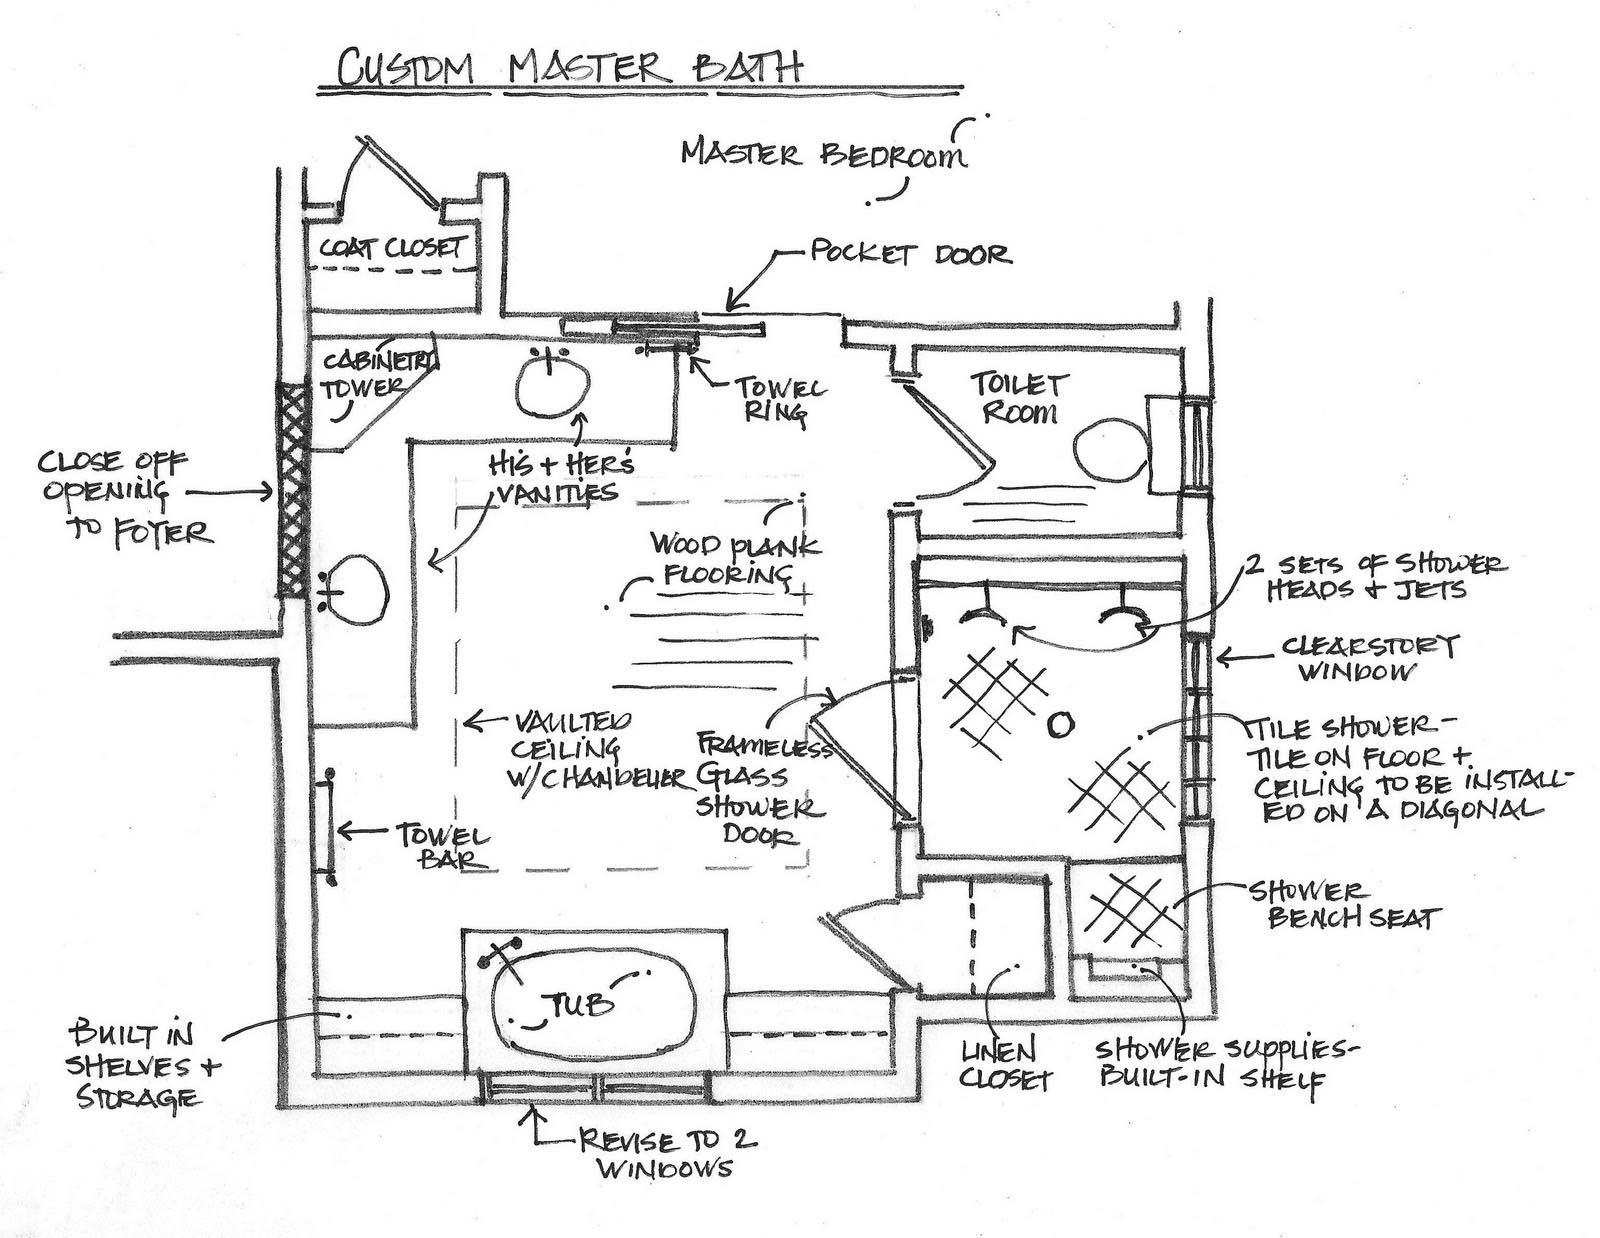 Bathroom And Closet Floor Plans Plans Free 10x16 Master